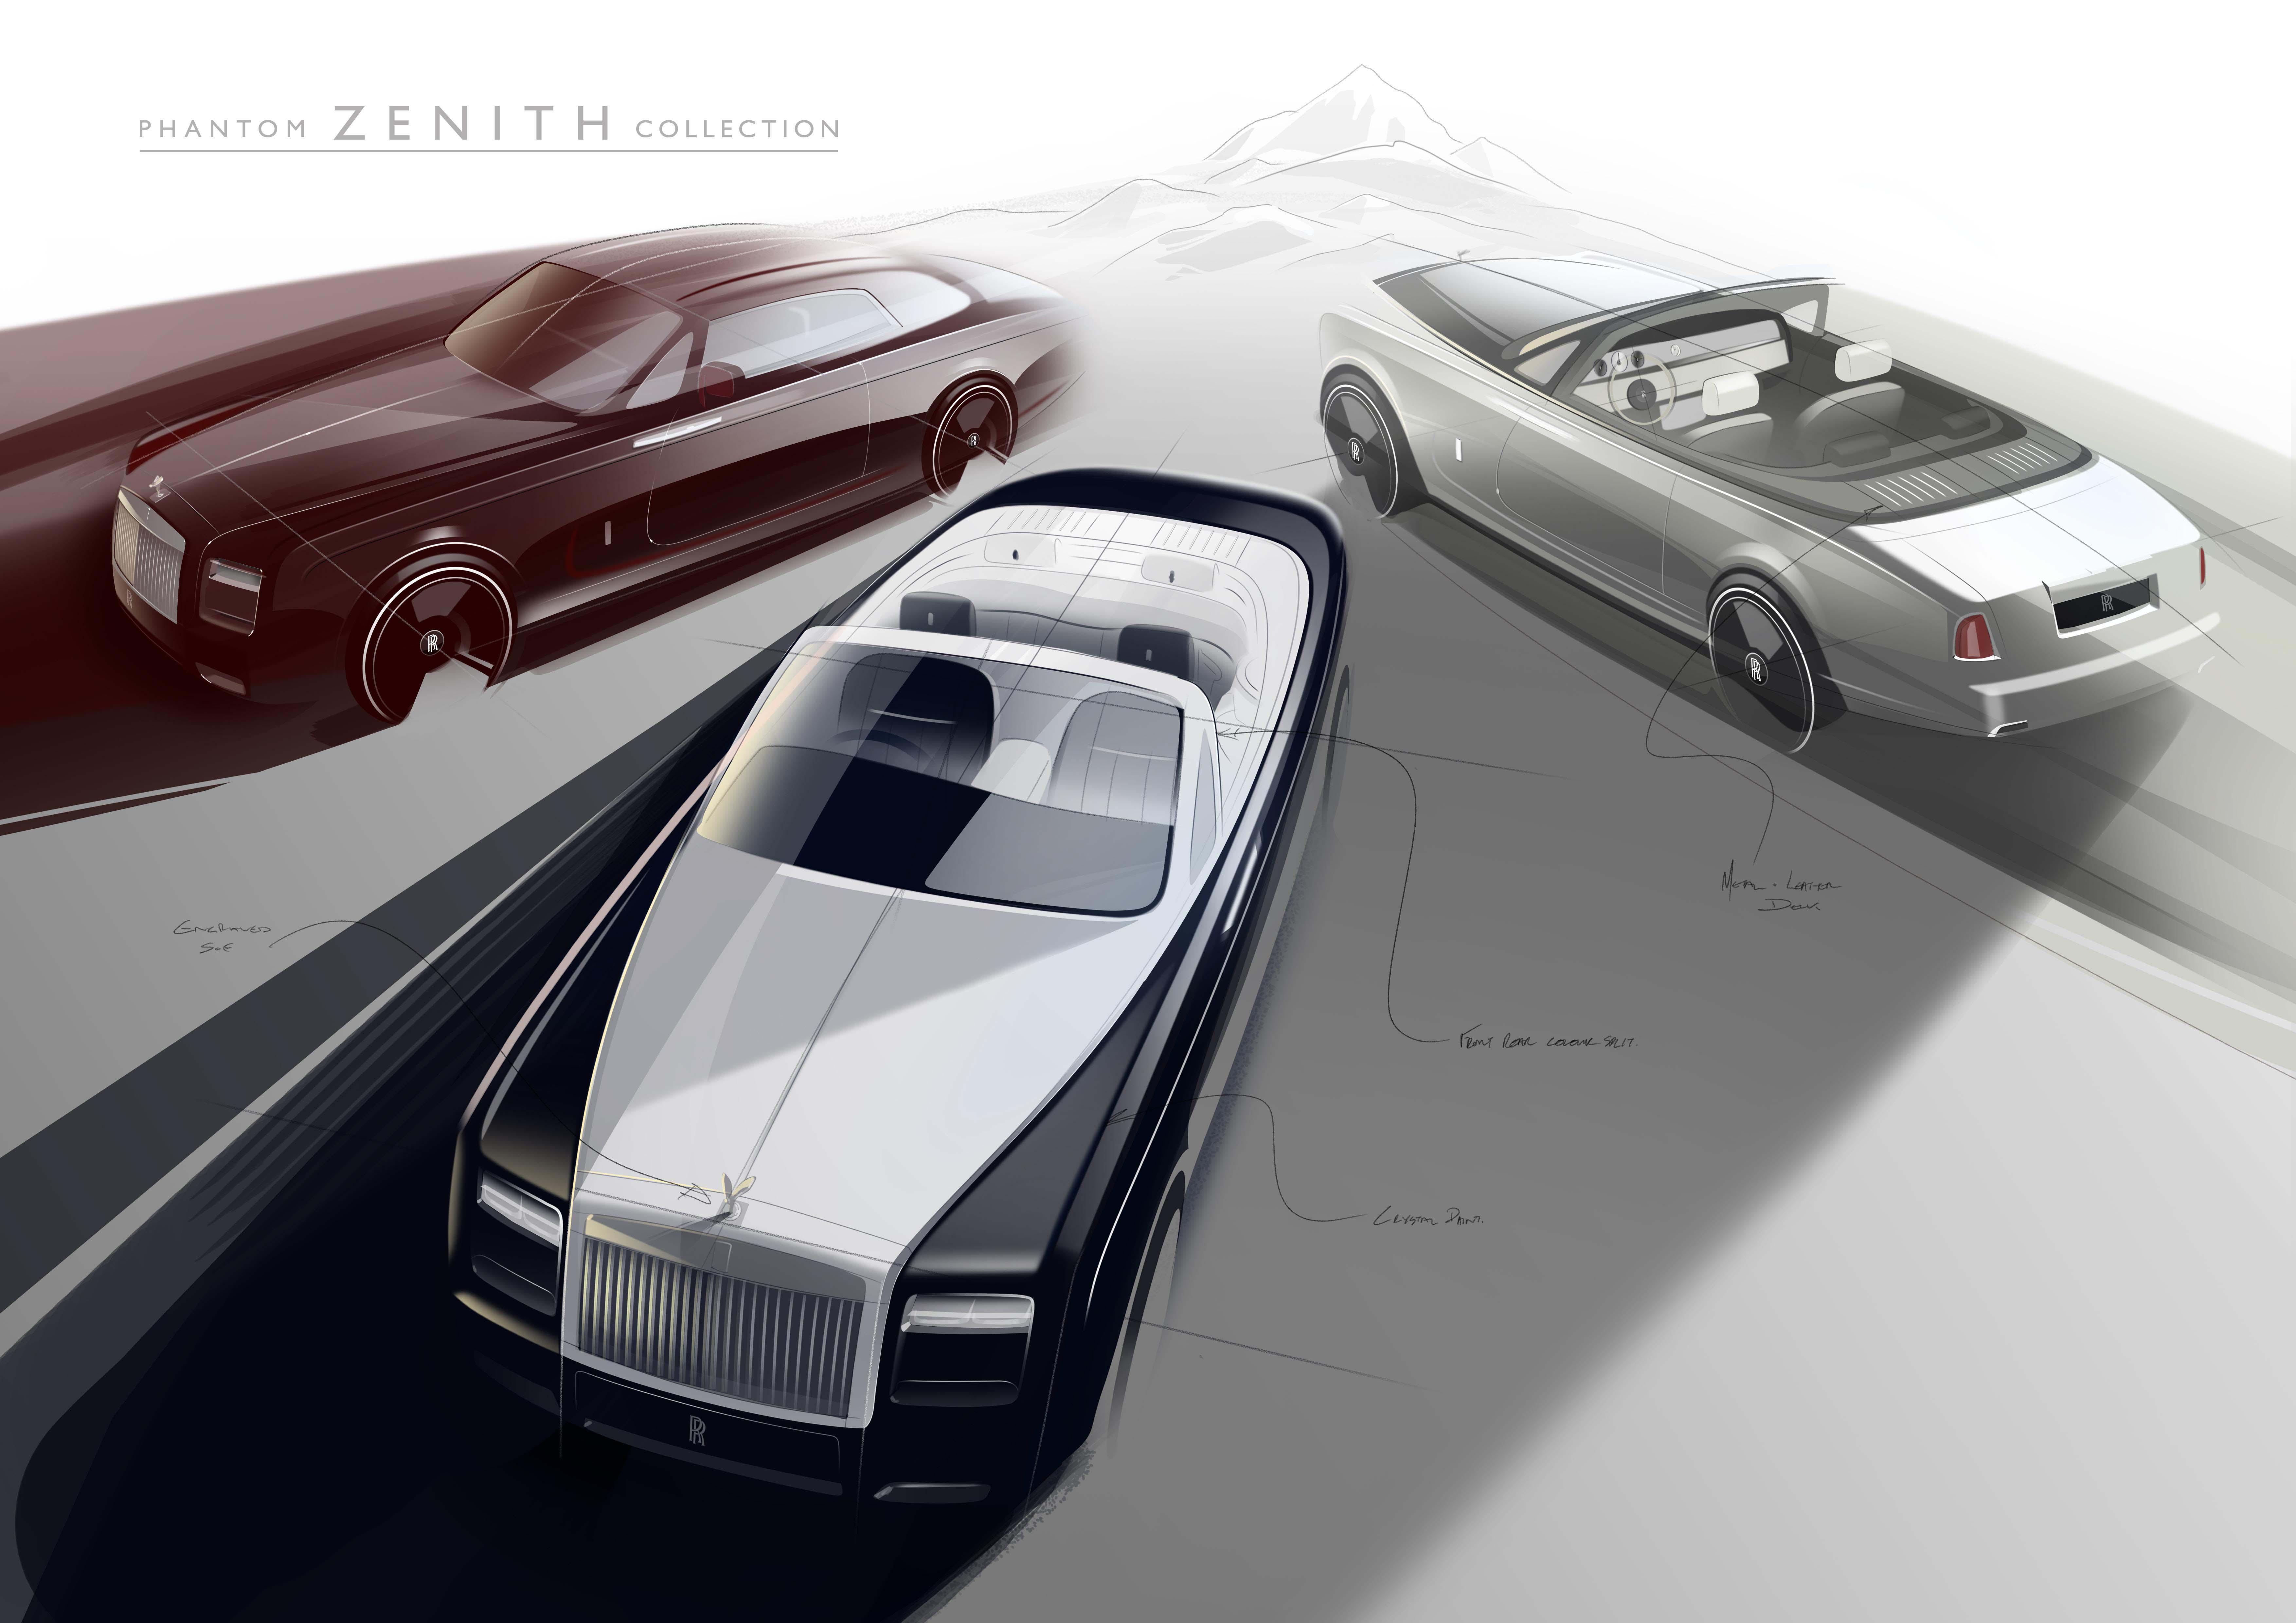 Rolls Royce Phantom VII Zenith Edition